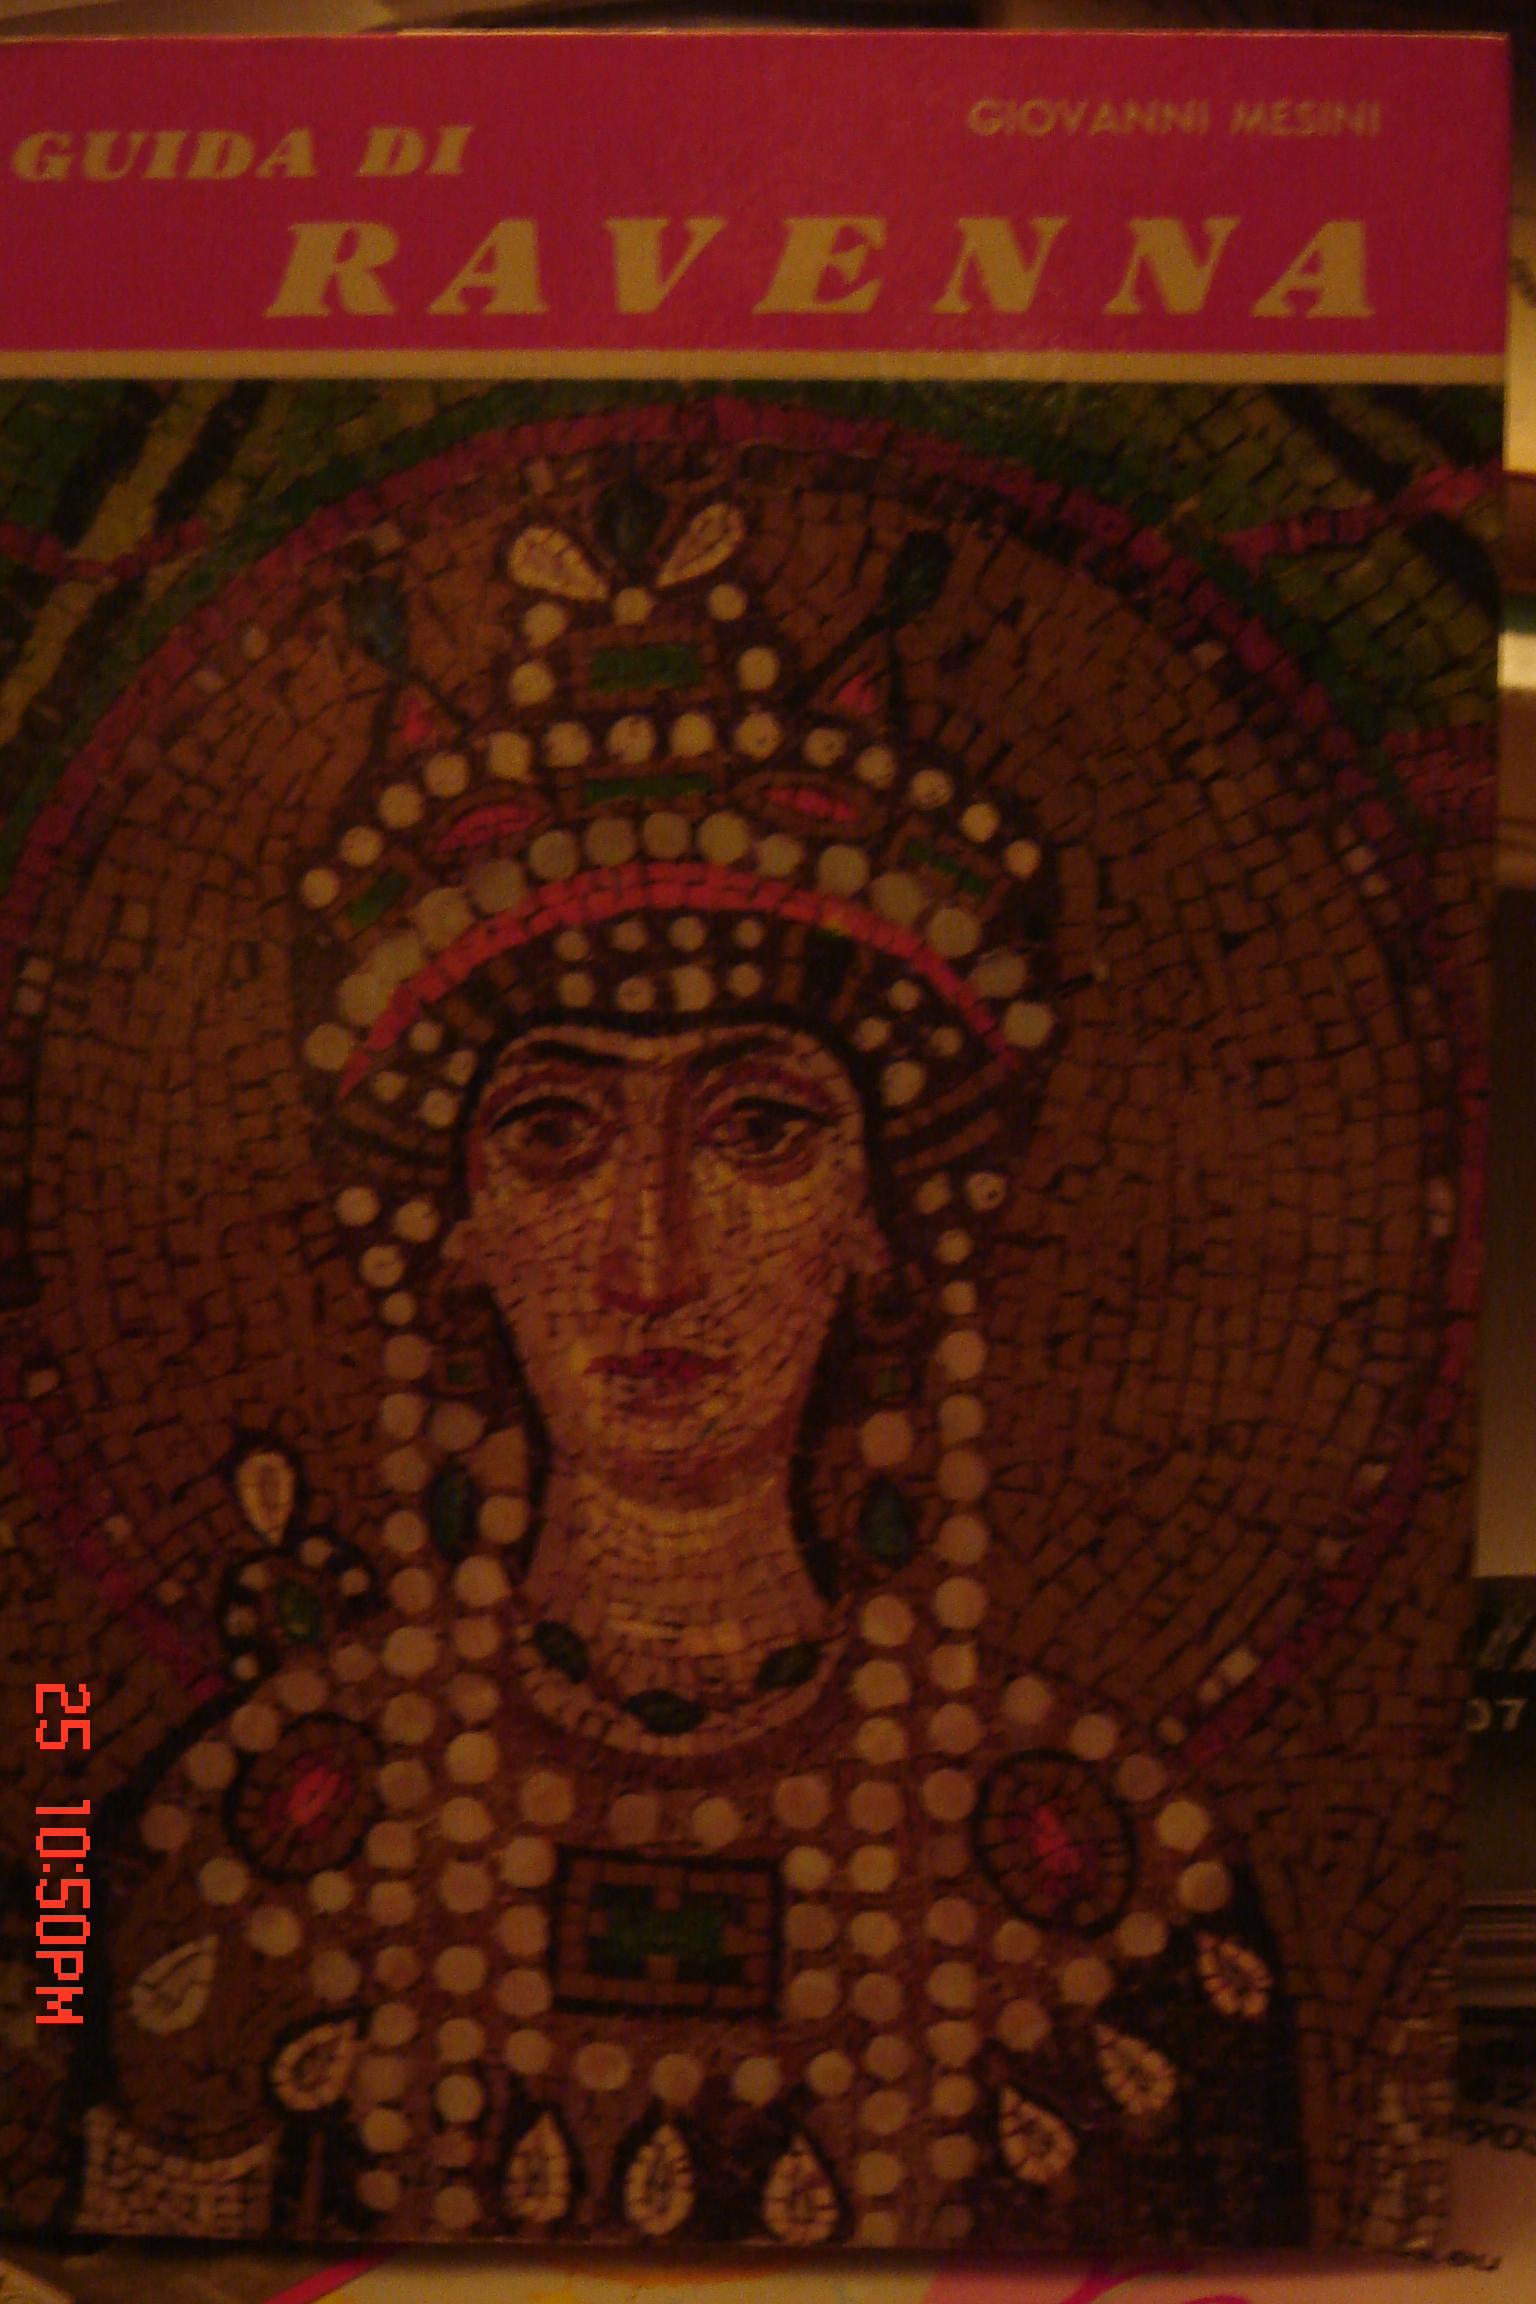 Guida di Ravenna